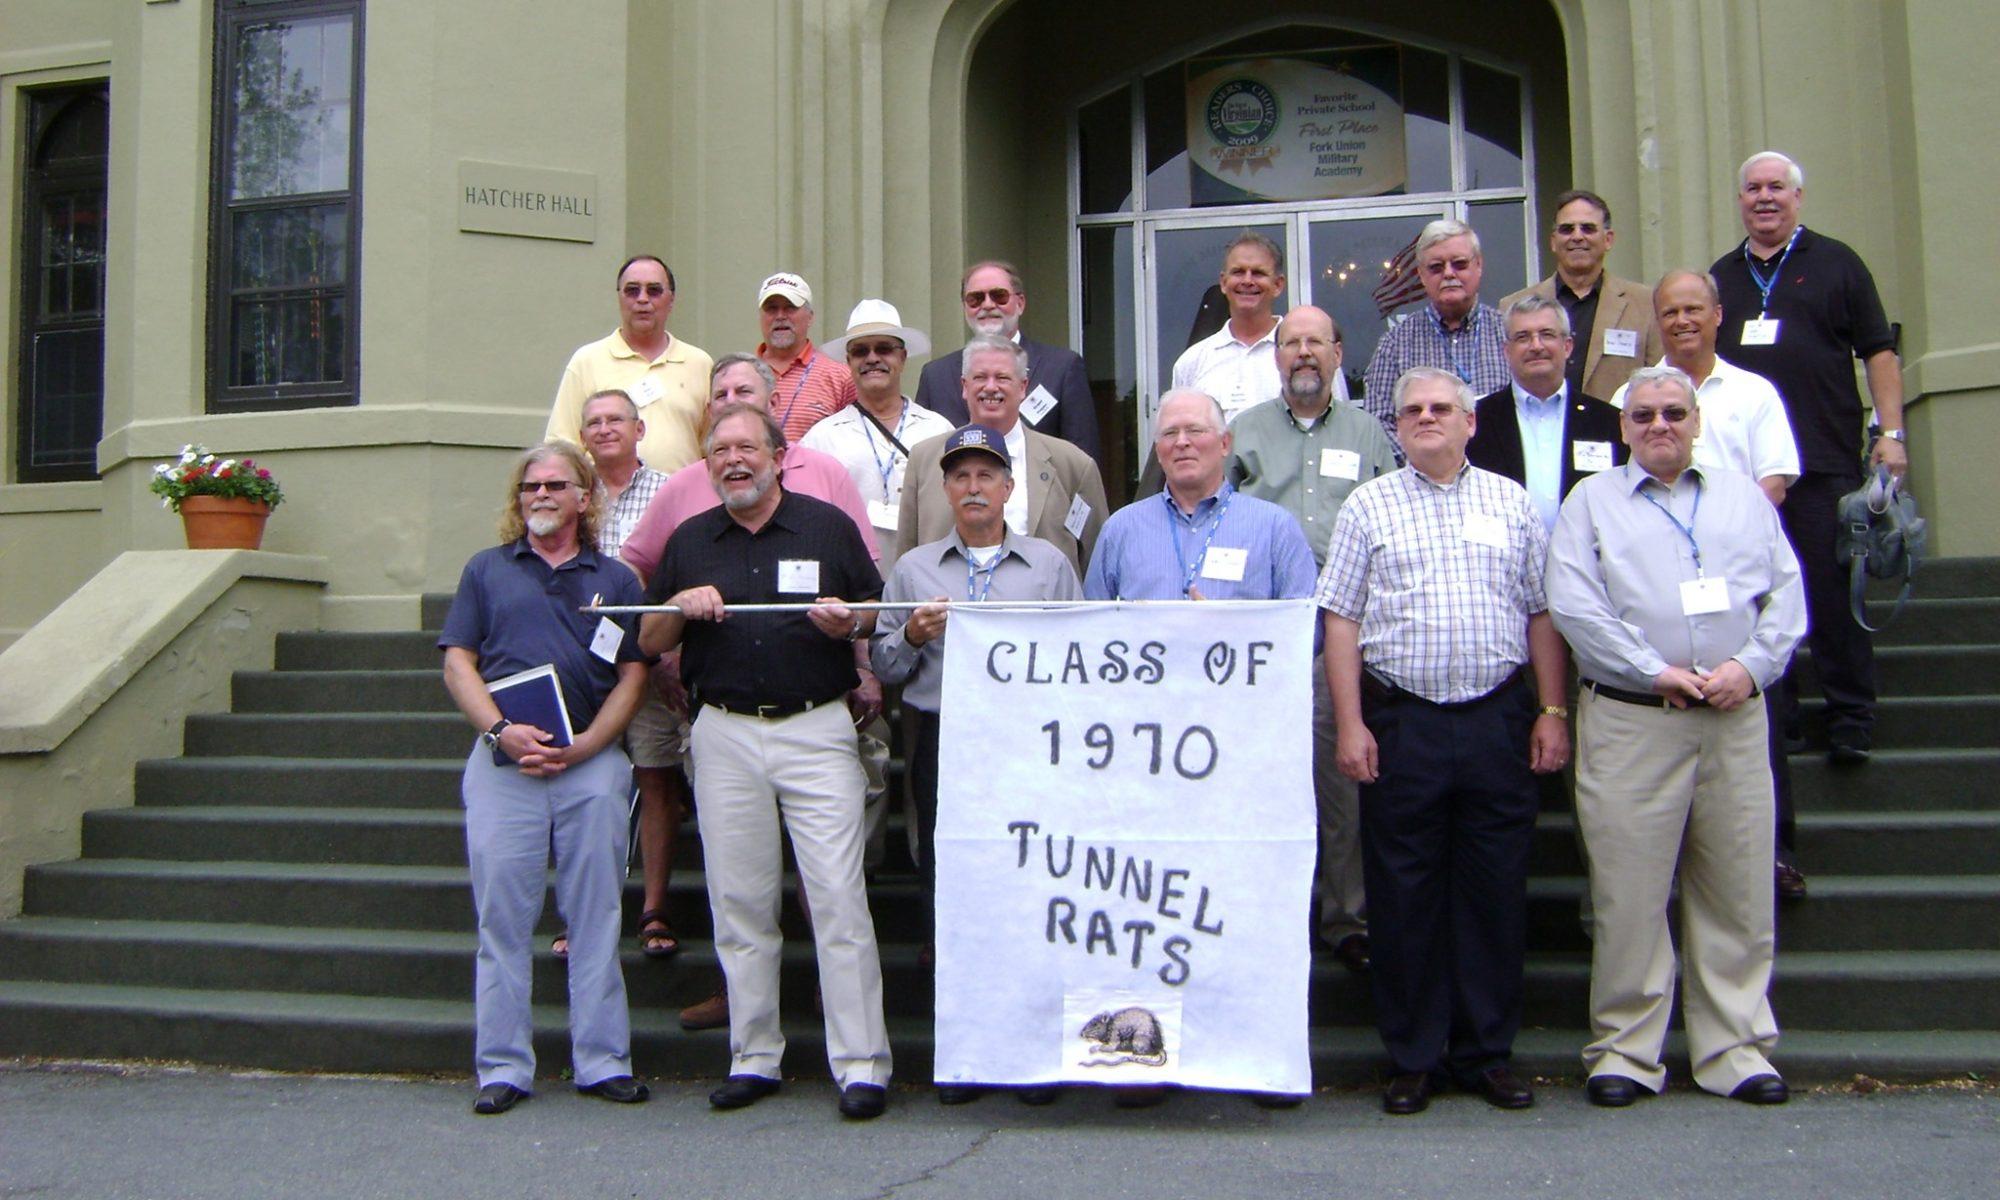 FUMA Class of 1970